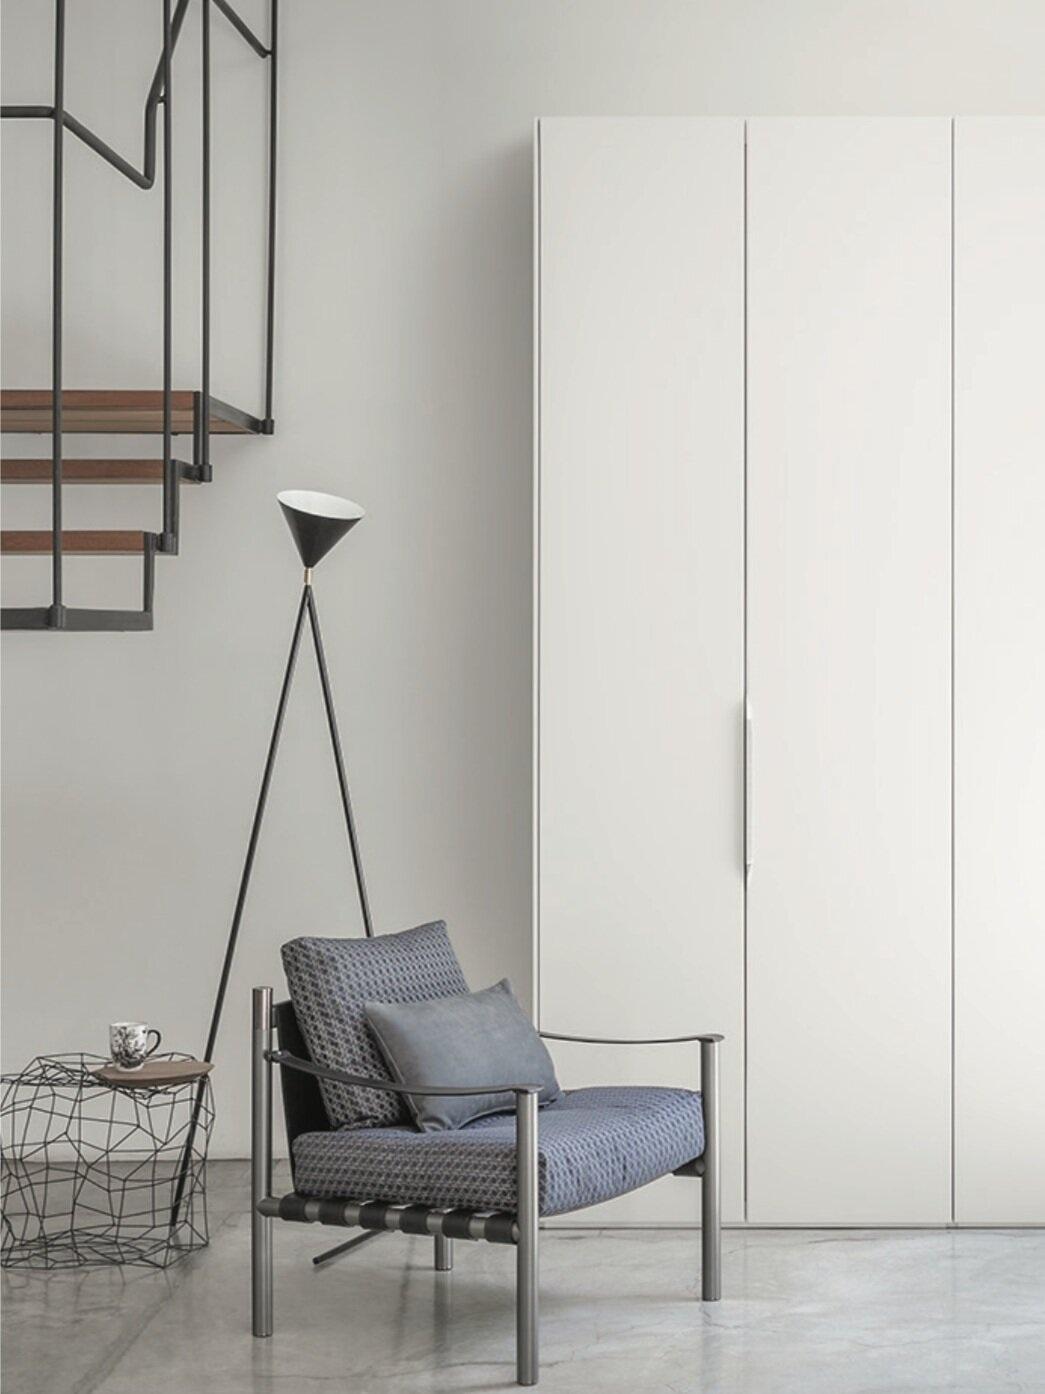 One   floor light | 184OL-F03 Styling Elena Caponi Studio, Photo Beppe Brancato